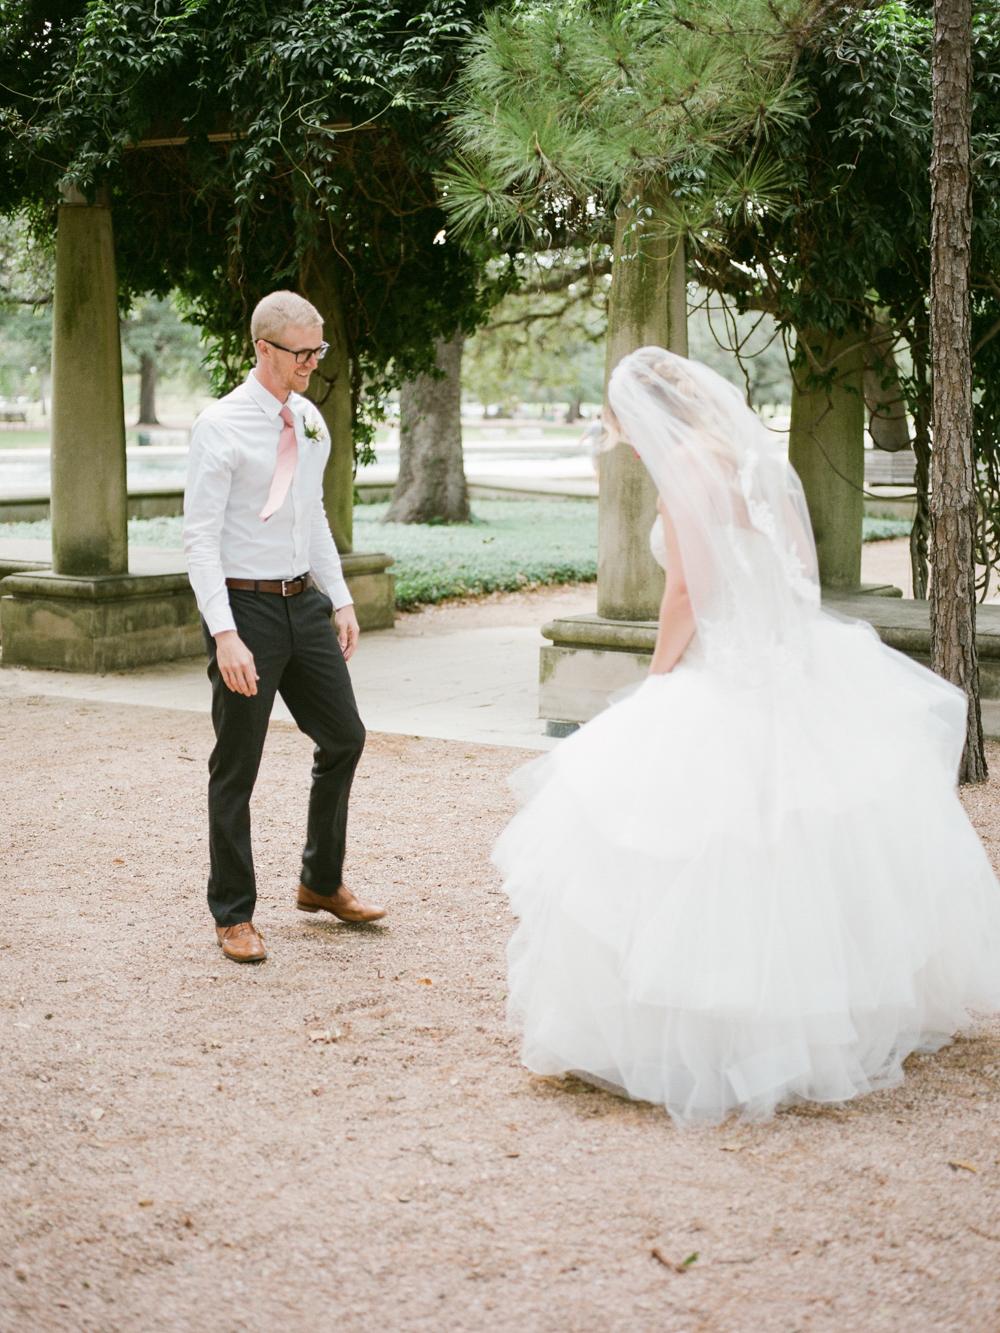 benefits of a first look_wedding photography_wedding photographer_film wedding photographer_Christine Gosch_www.christinegosch.com_Houston, Texas wedding photographer_ Houston, Texas-14.jpg